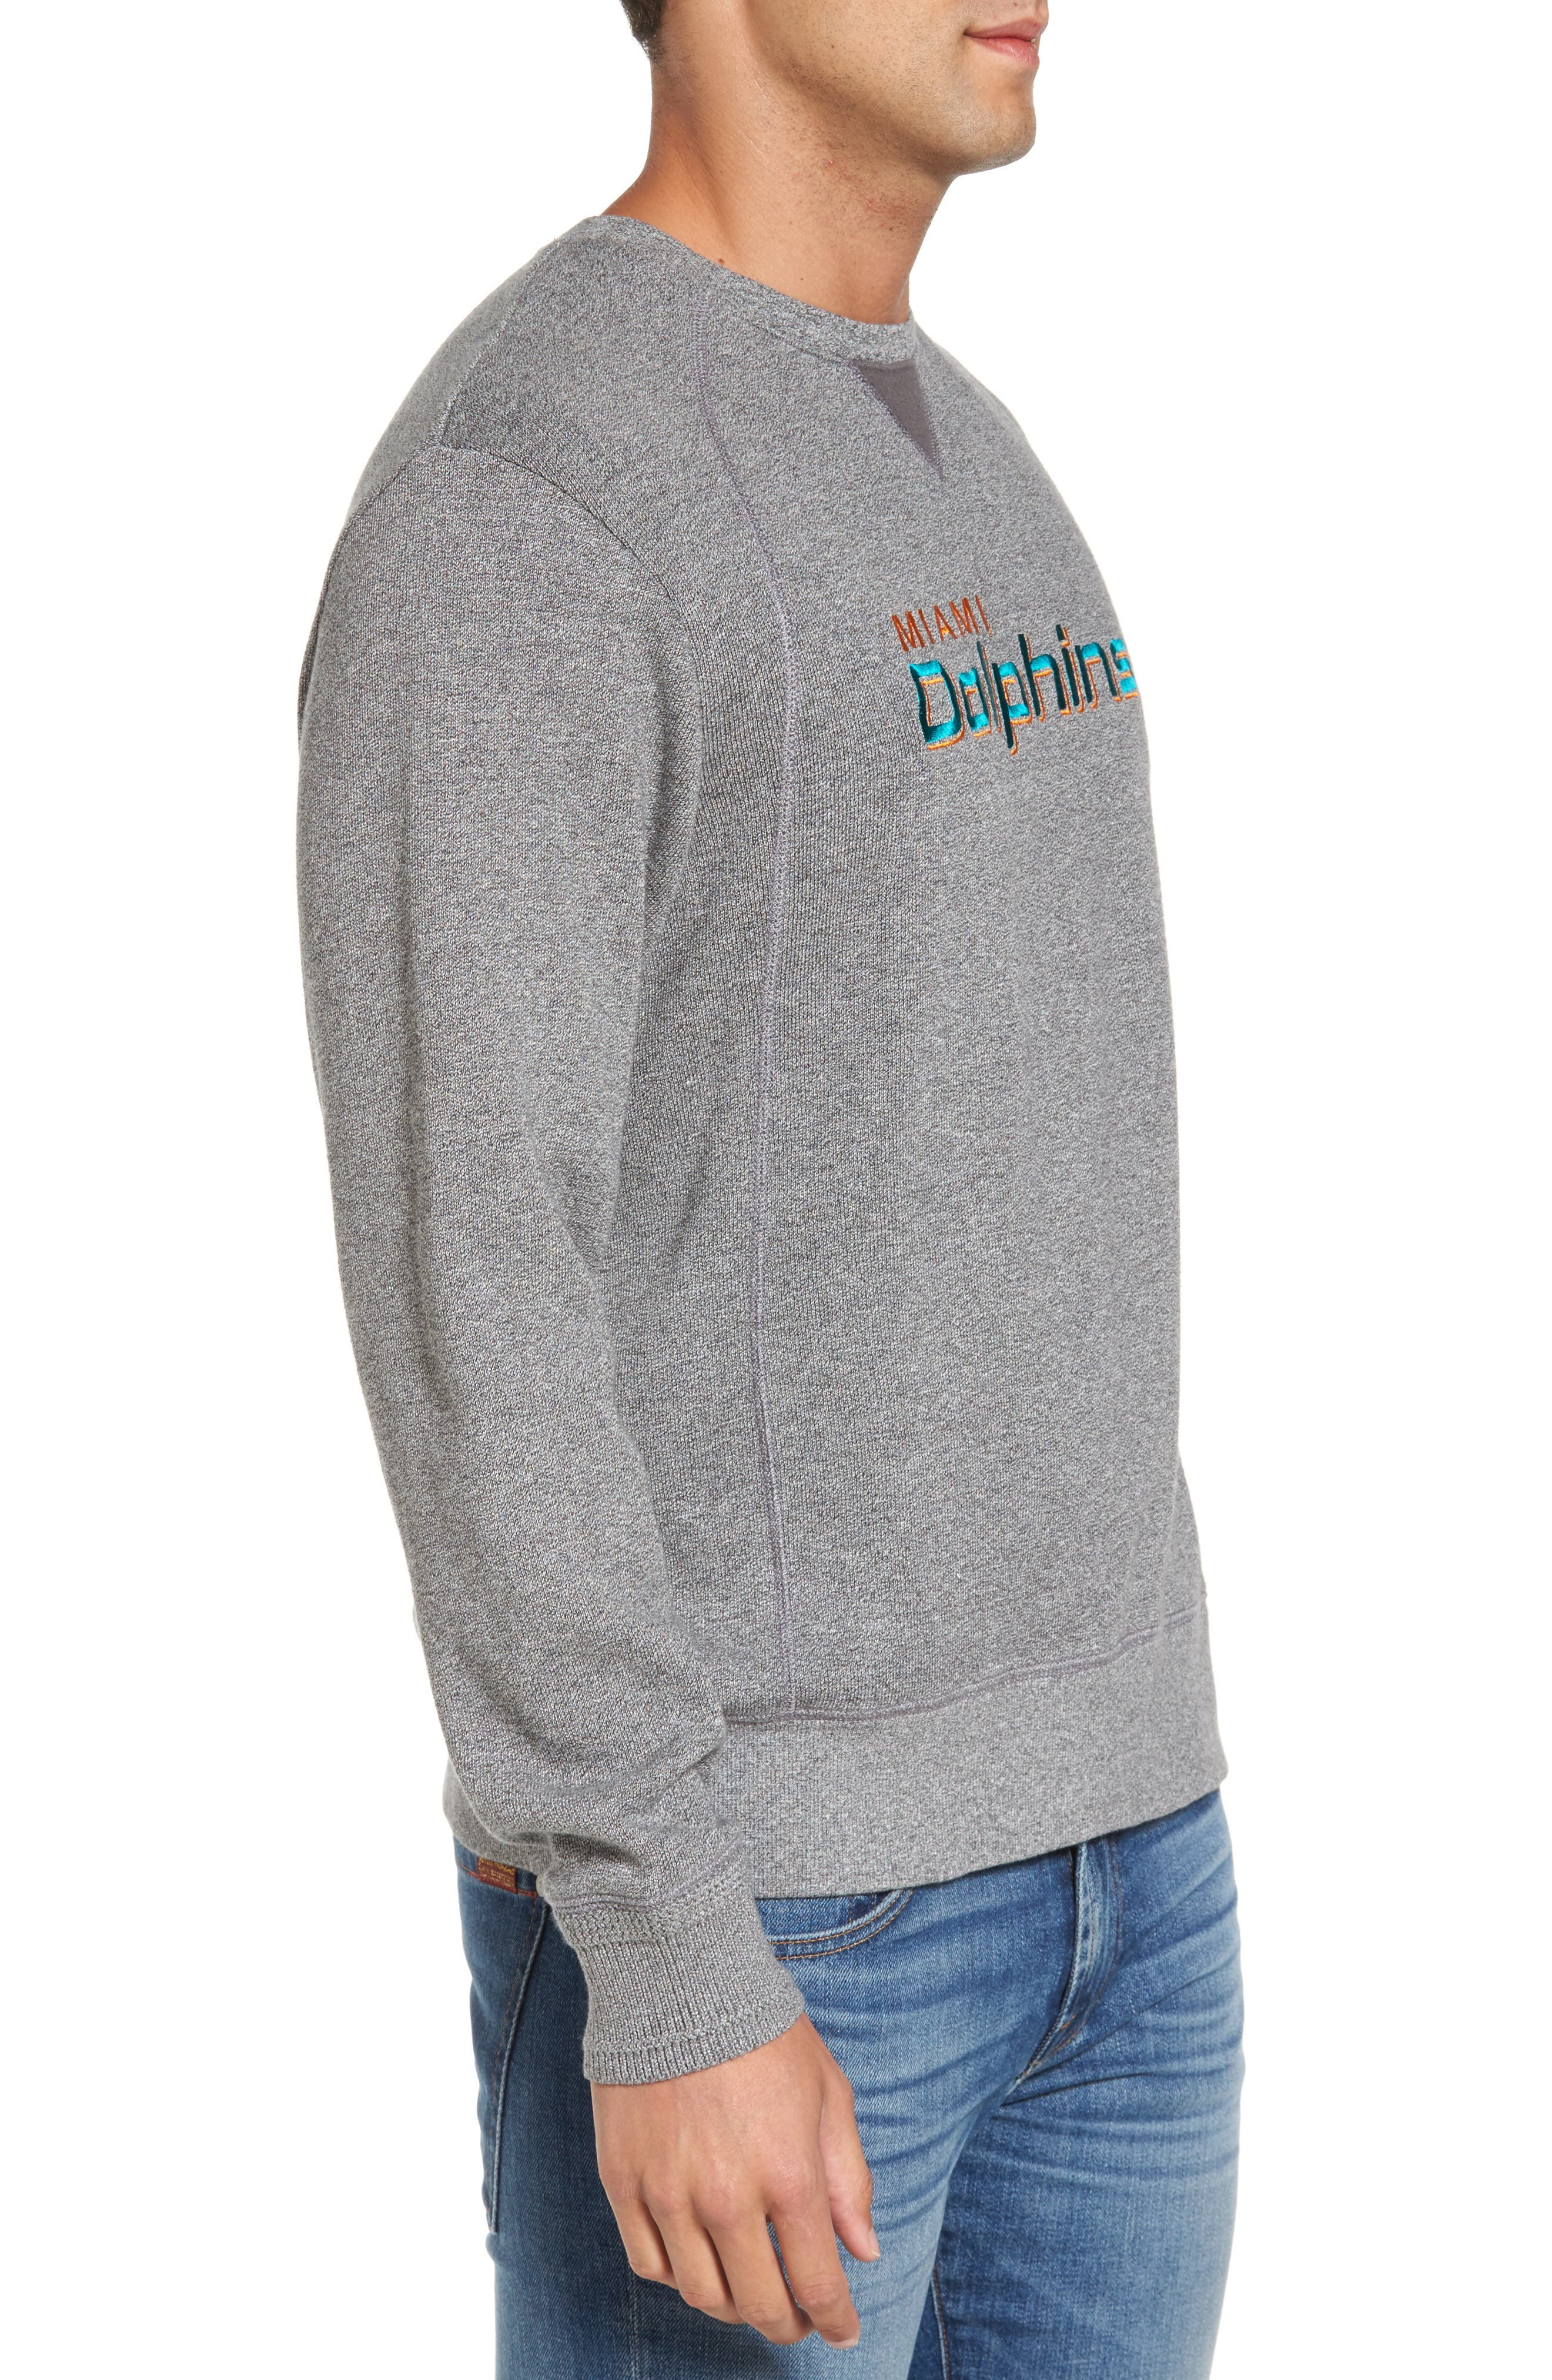 NFL Stitch of Liberty Embroidered Crewneck Sweatshirt,                             Alternate thumbnail 75, color,